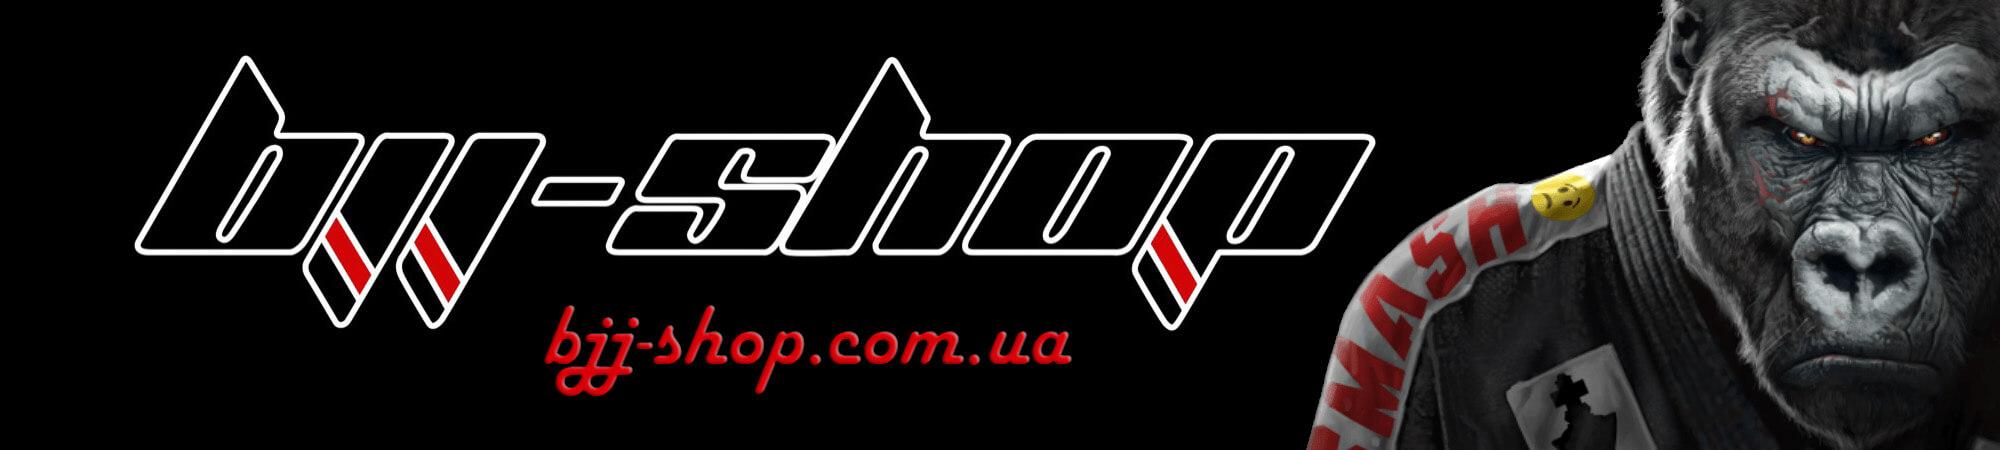 Інтернет-магазин http://bjj-shop.com.ua/